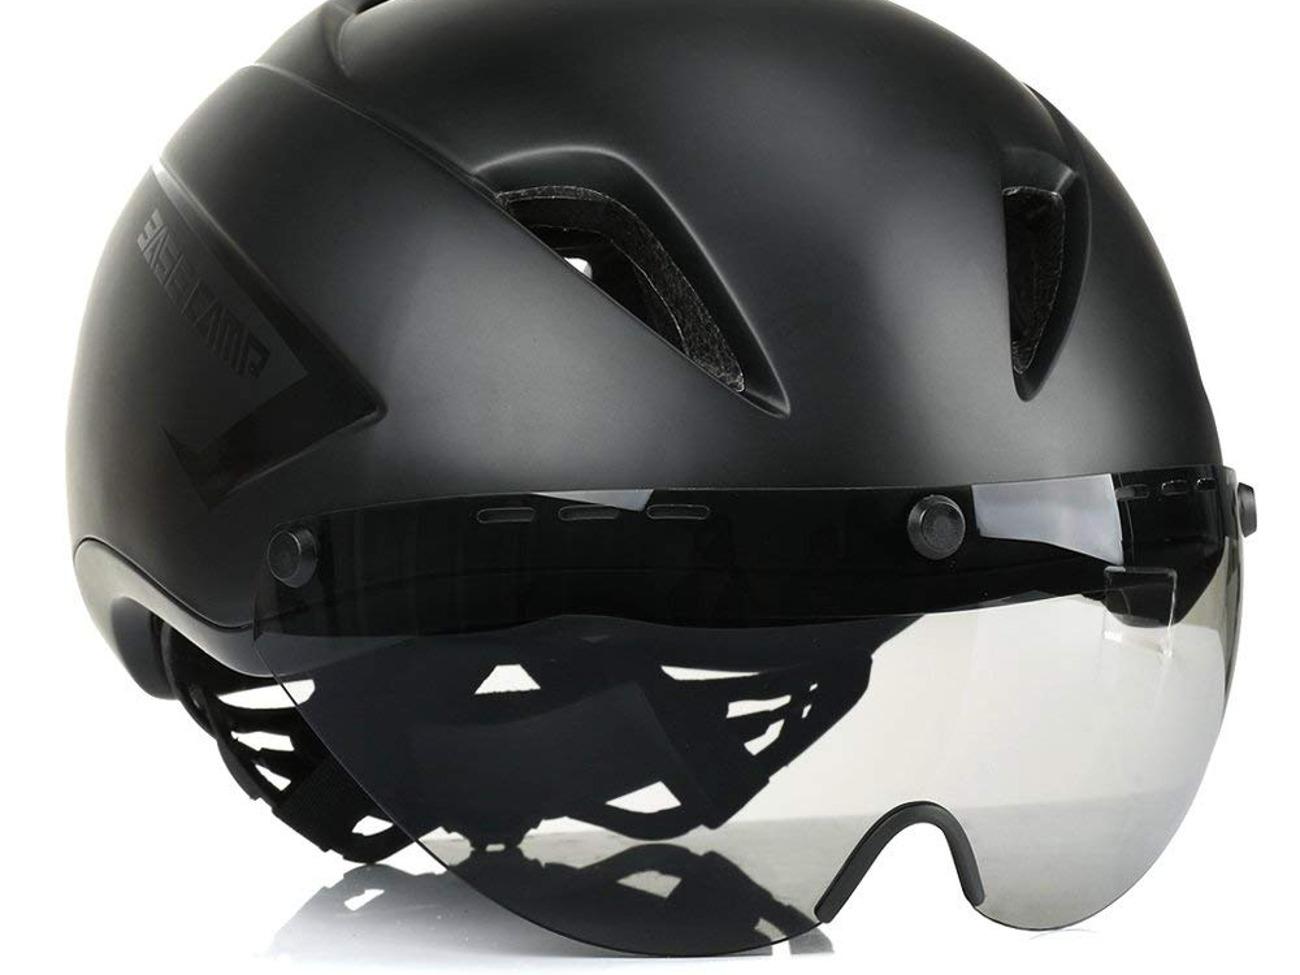 BASE CAMP AIRCROSS Road Bike Helmet with Detachable Shield Visor.